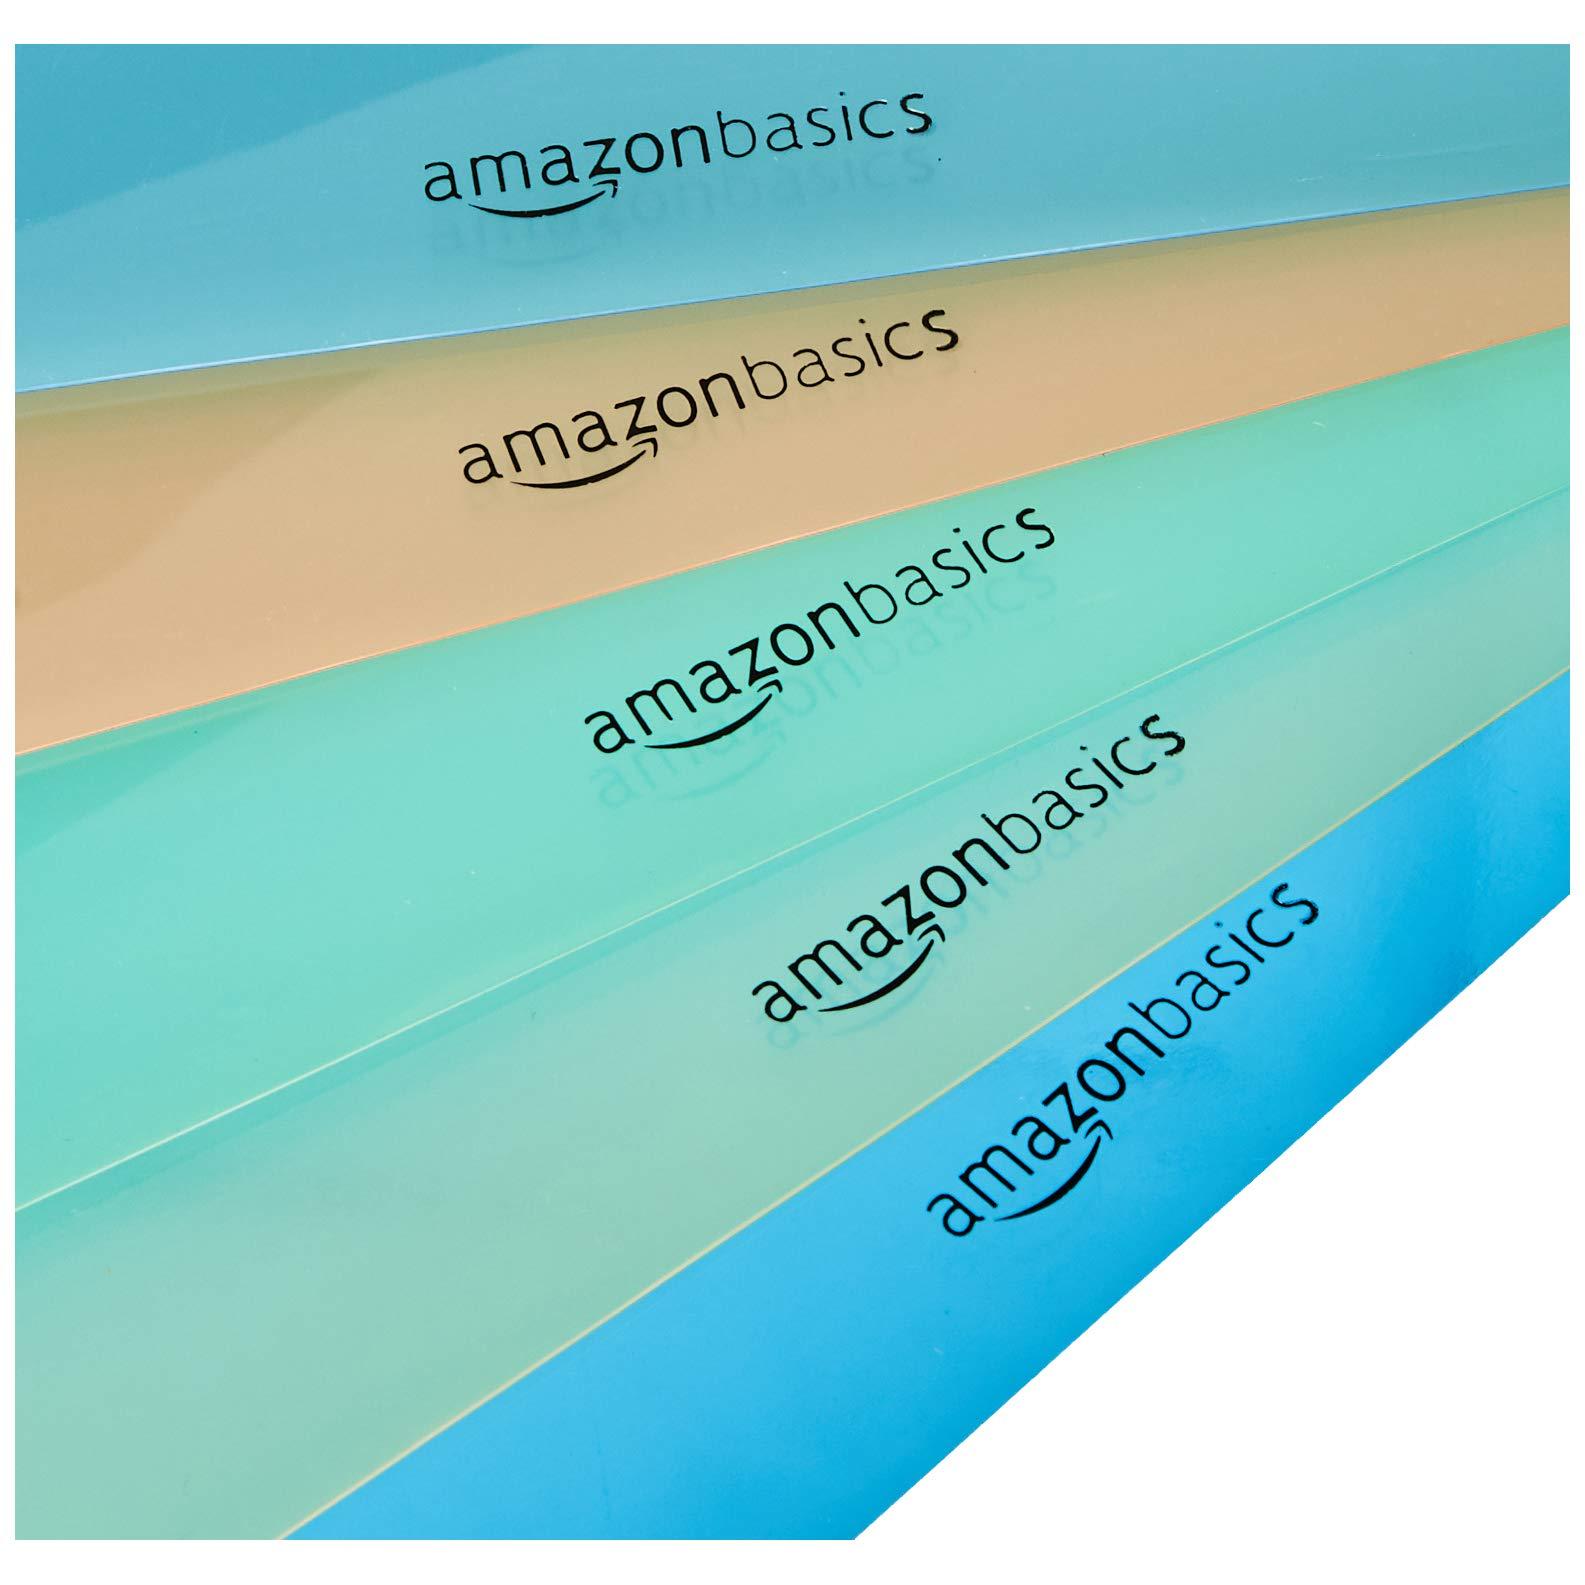 Amazon Basics Binder Organizer Poly Jacket, 3 Hole Punch, Assorted Colors, Pack of 5